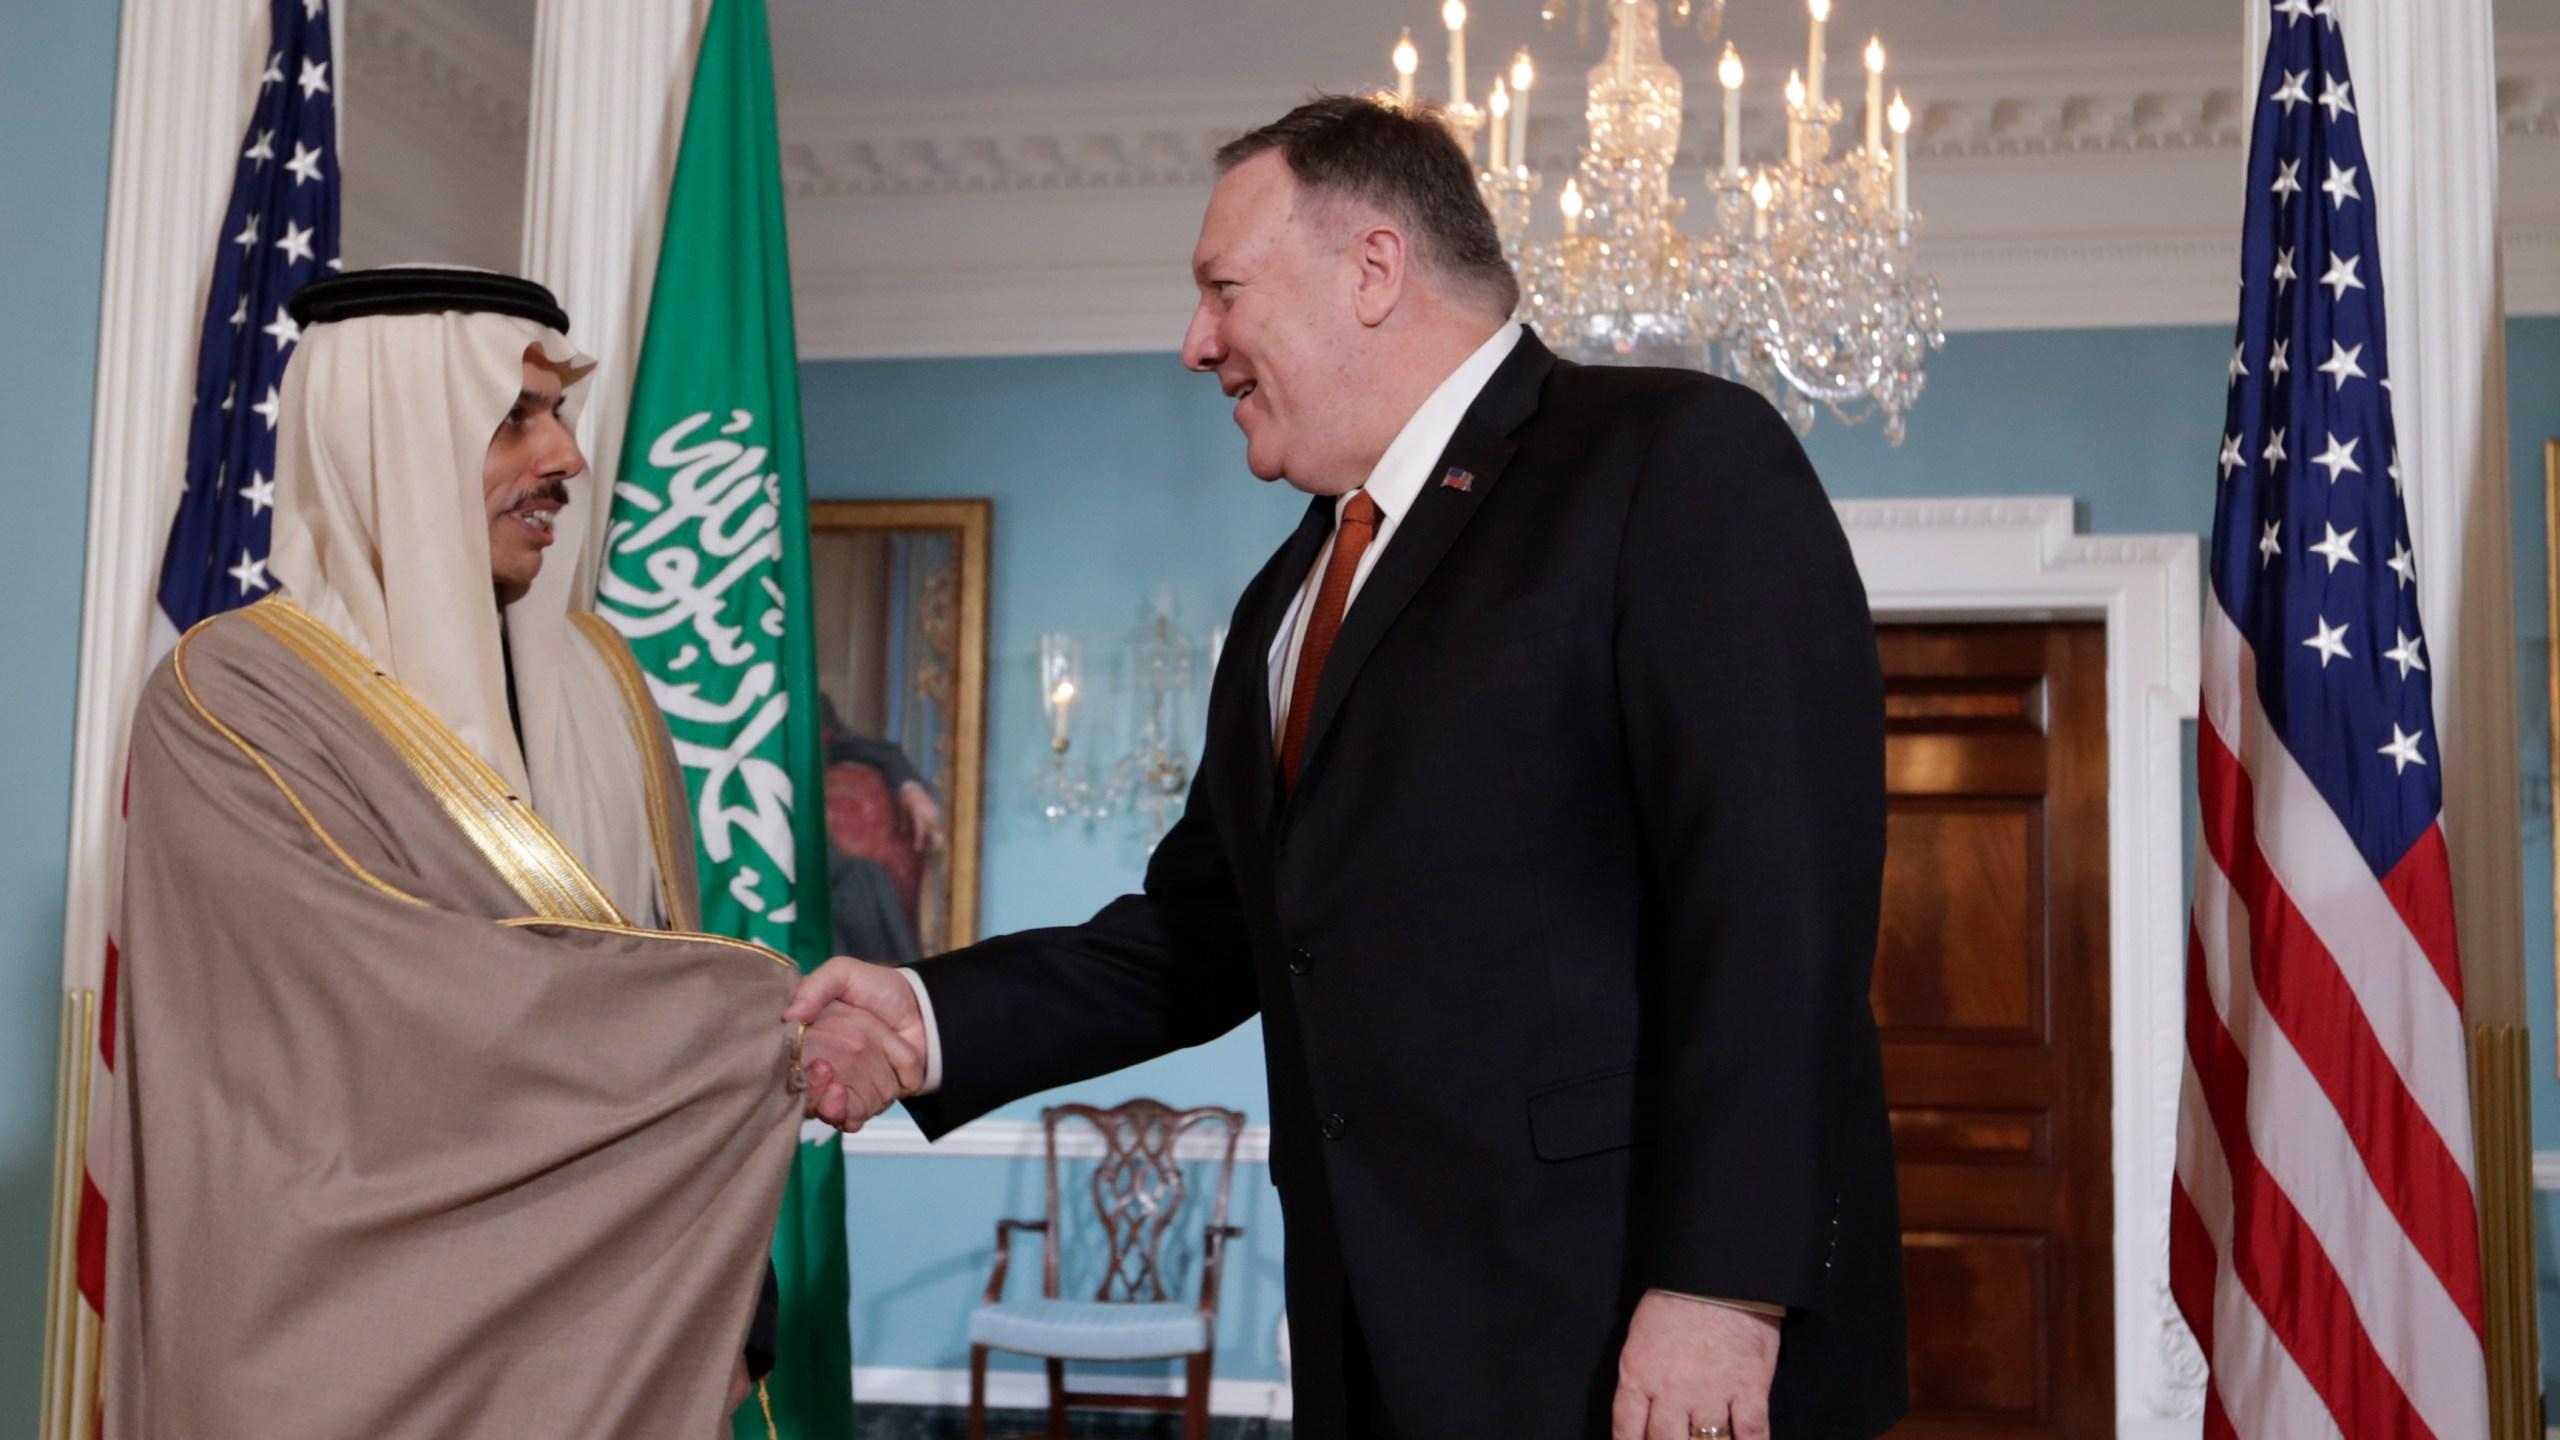 Mike Pompeo, Faisal bin Farhan Al Saud